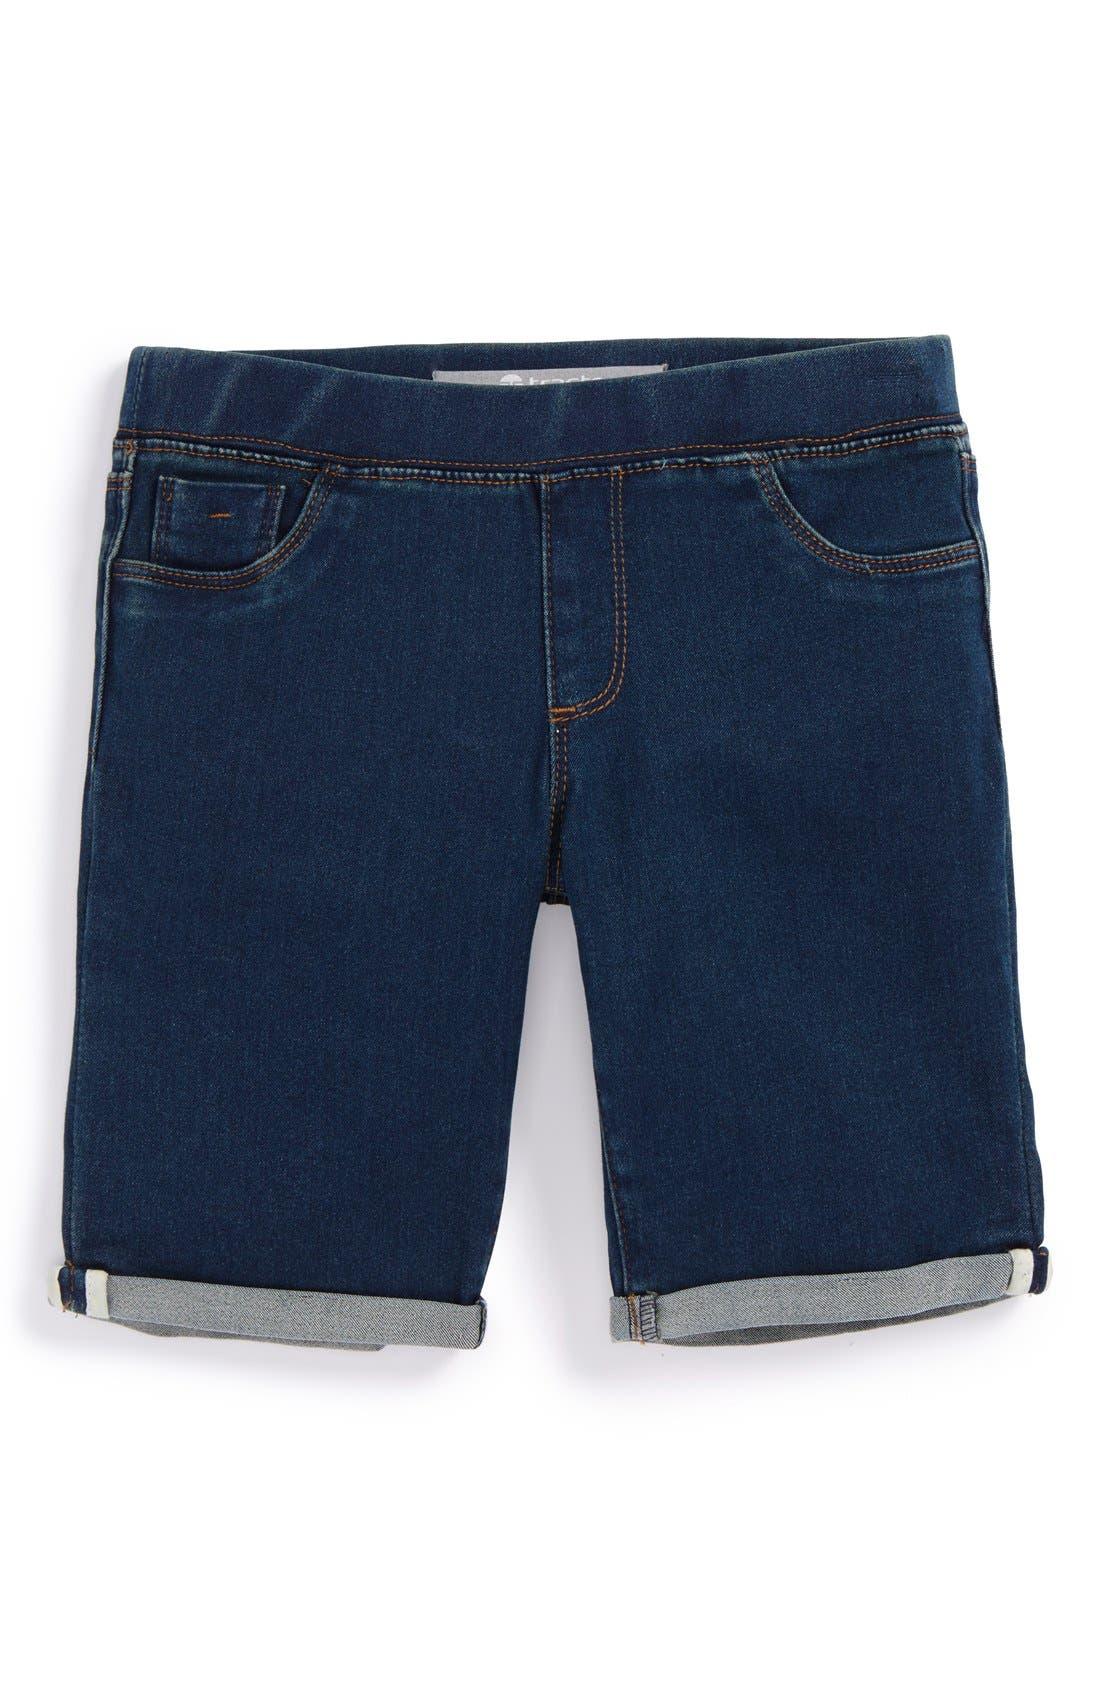 Alternate Image 1 Selected - Tractr Bermuda Shorts (Big Girls)